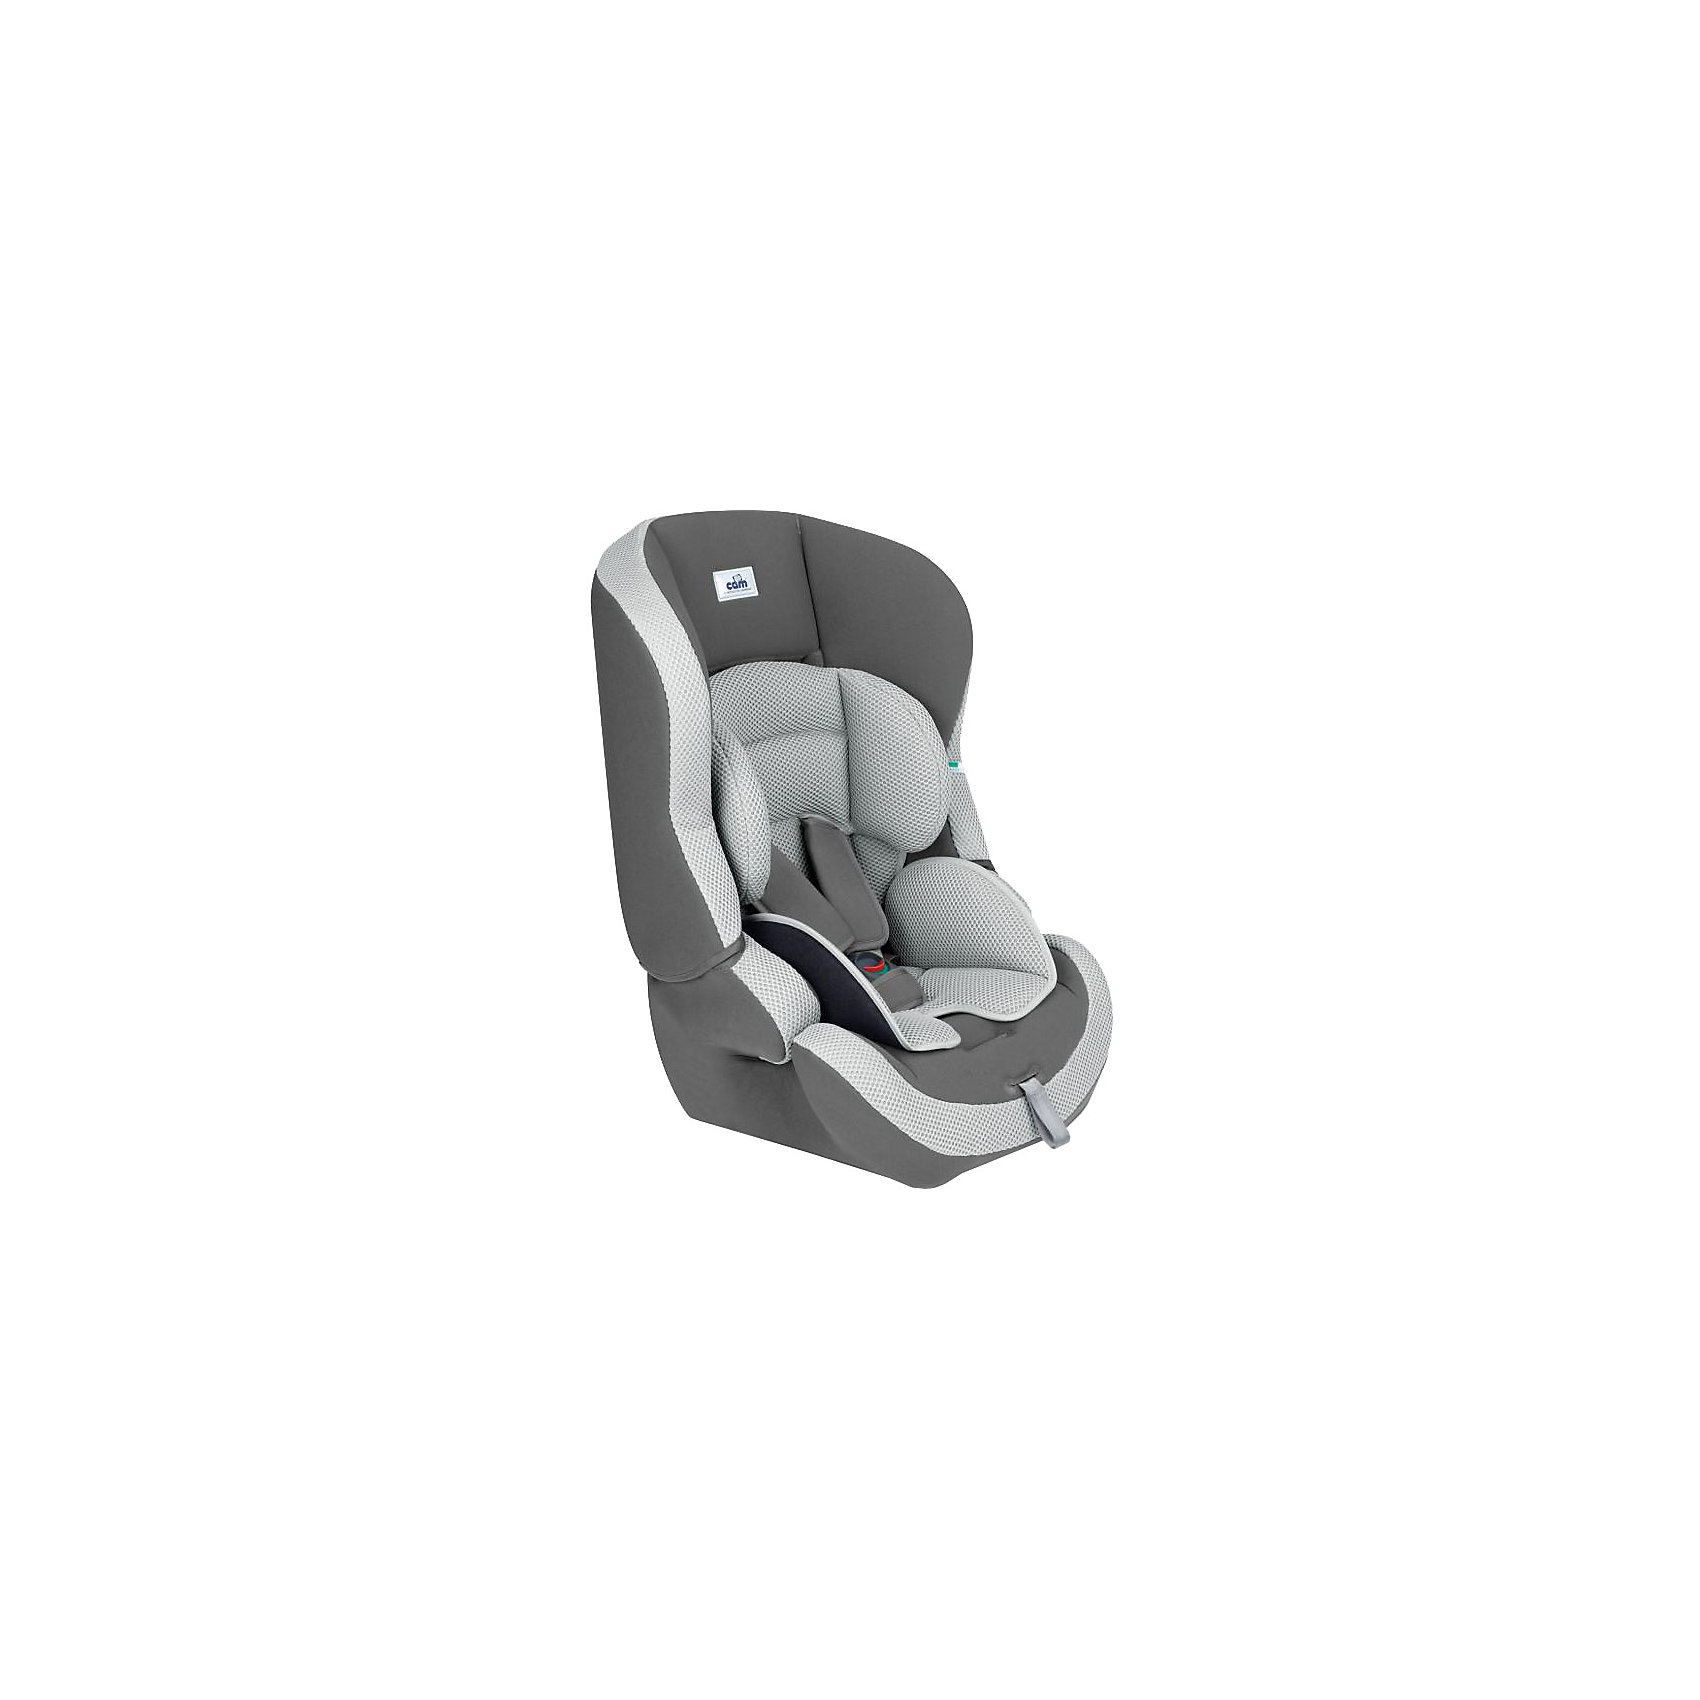 Автокресло Travel Evolution, 9-36 кг, CAM, серый